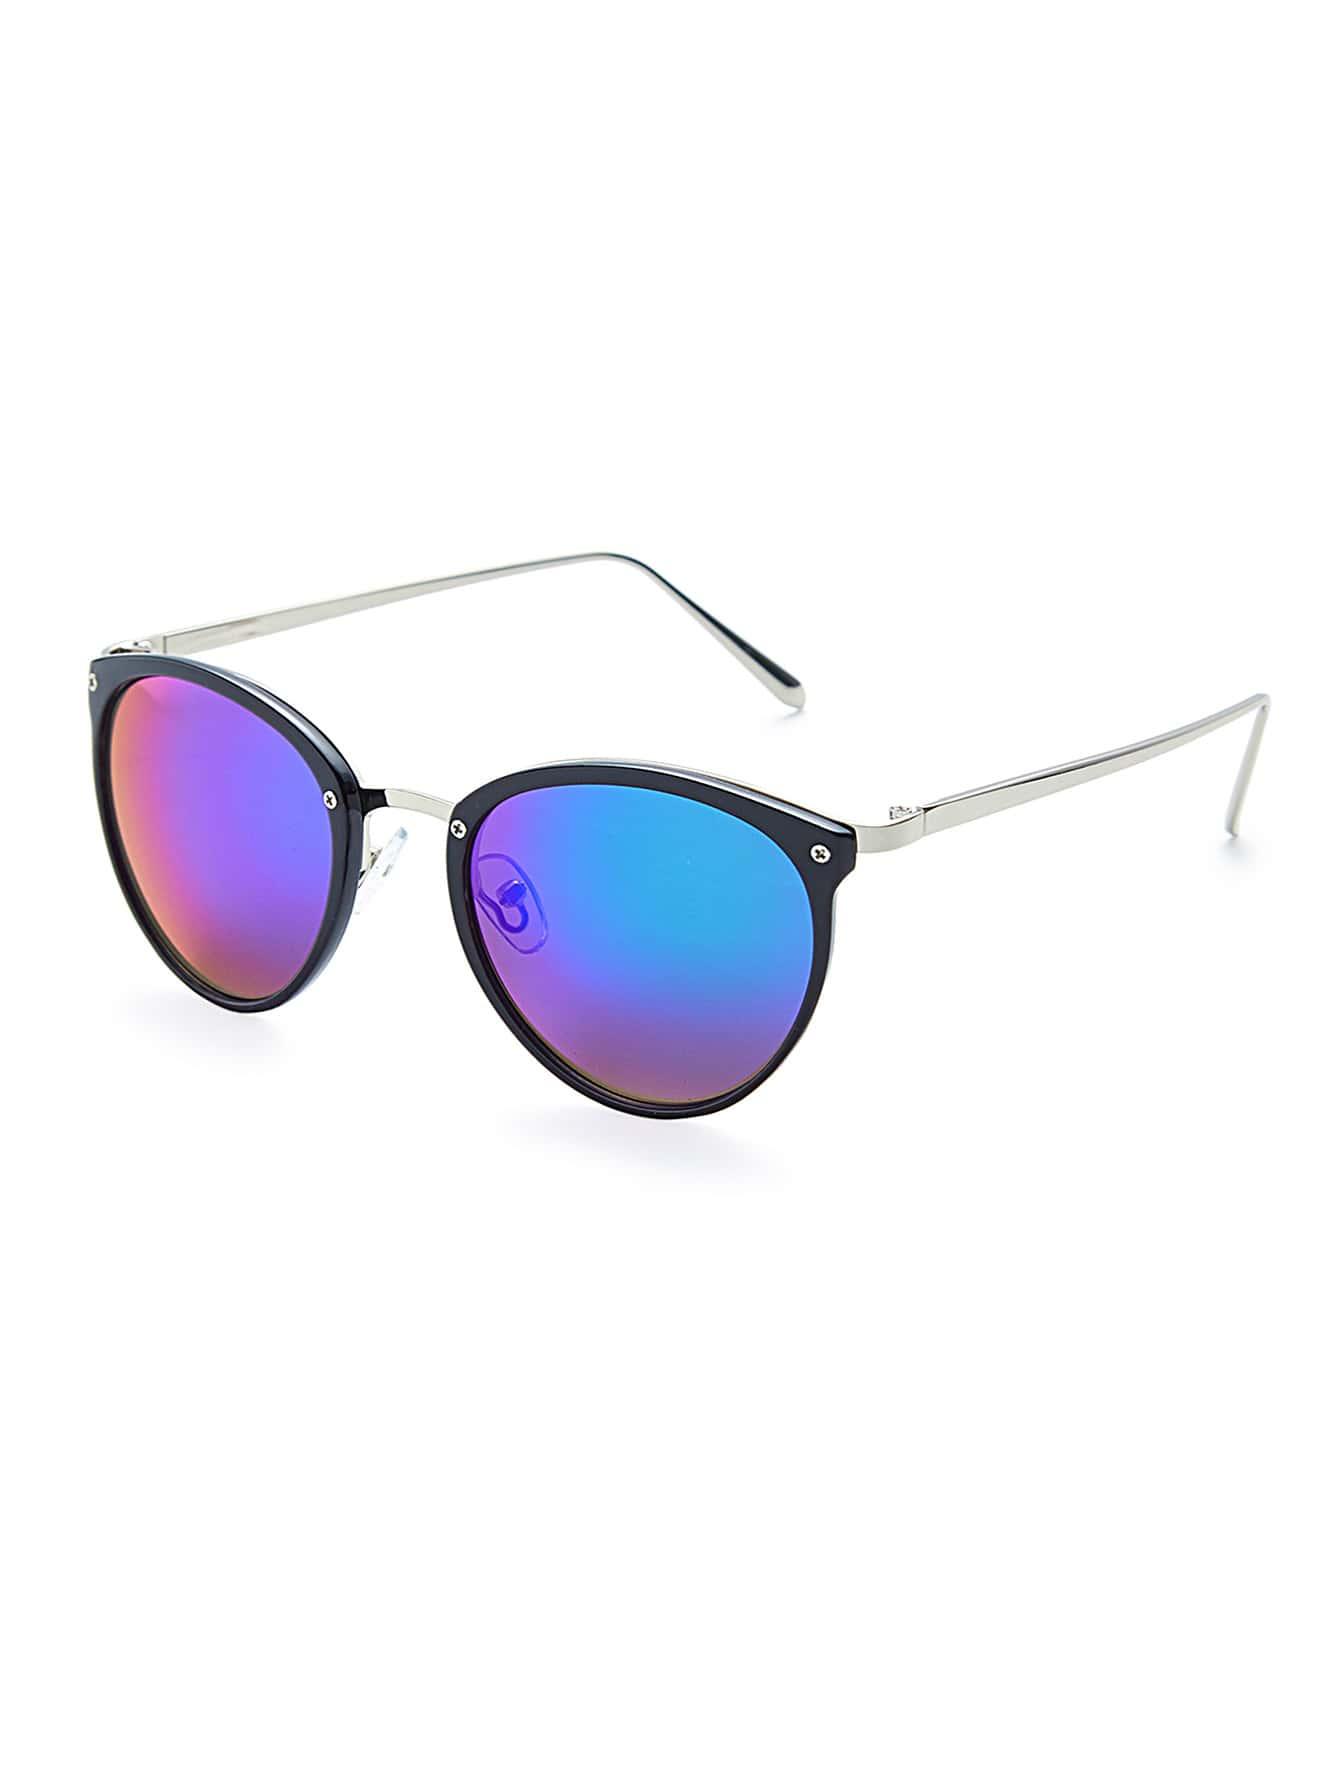 Skinny Frame Flash Lens Sunglasses